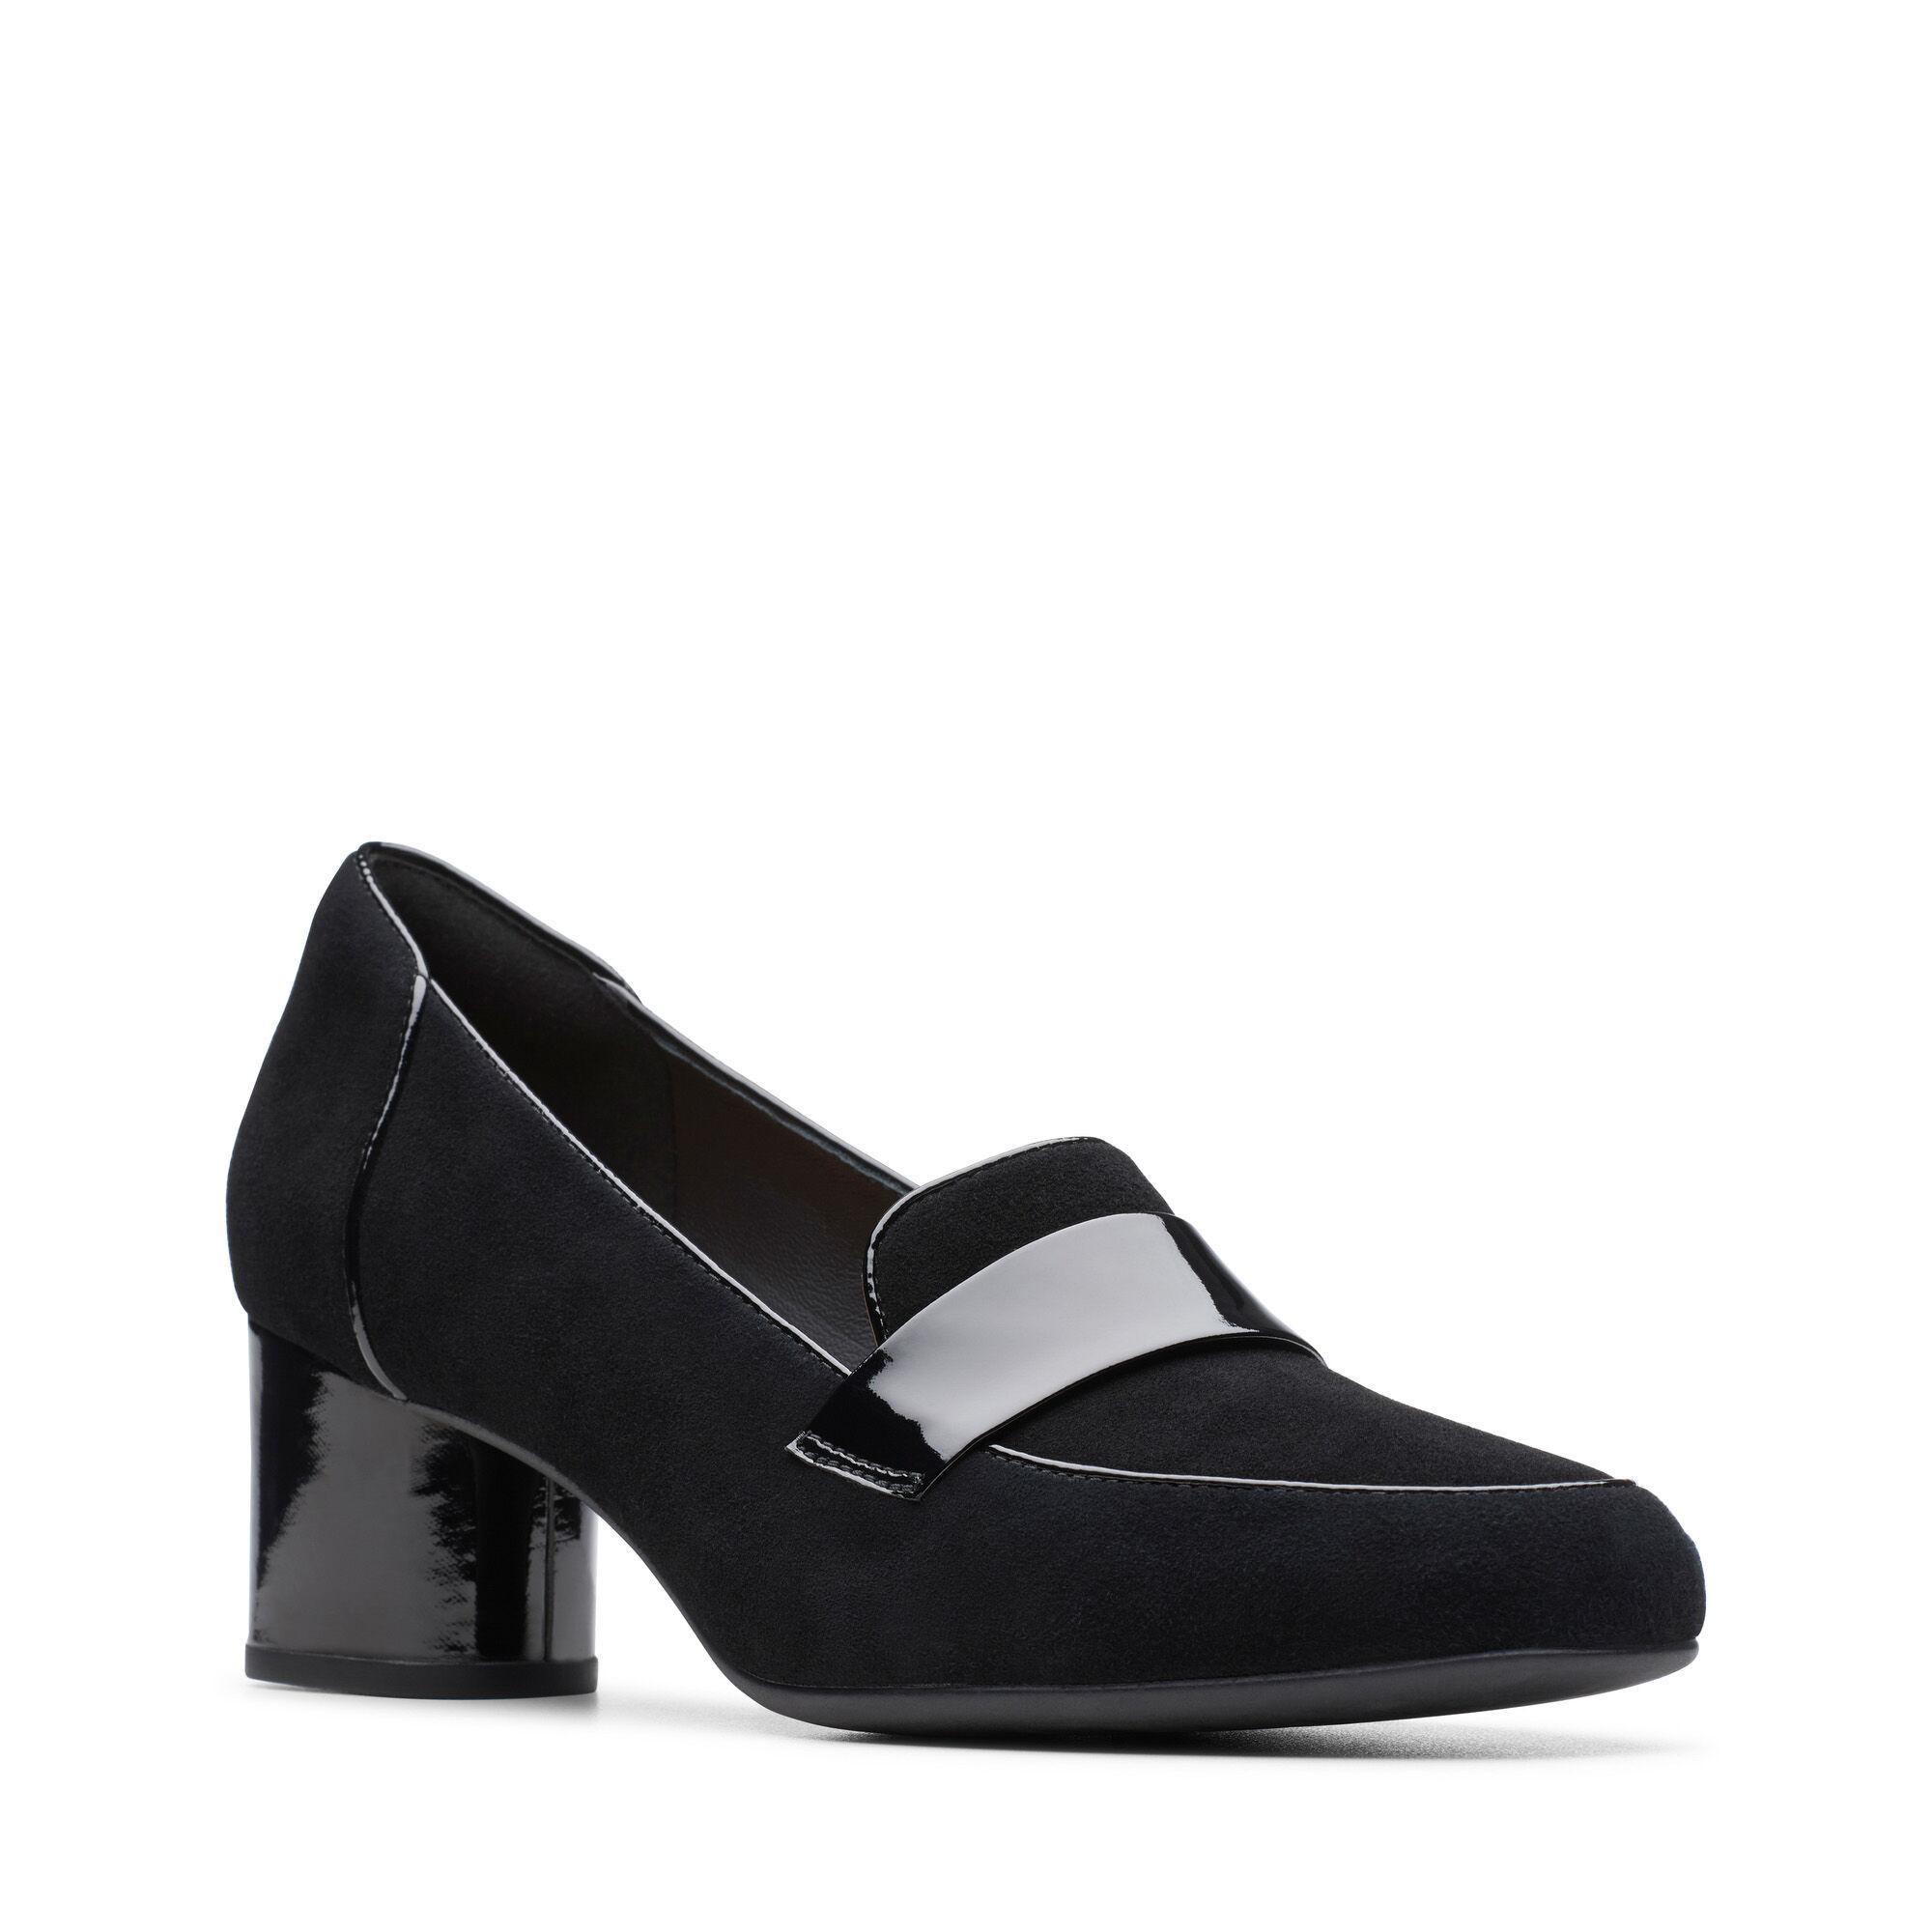 Un Cosmo Way Black Combination Clarks Shoes Official Site